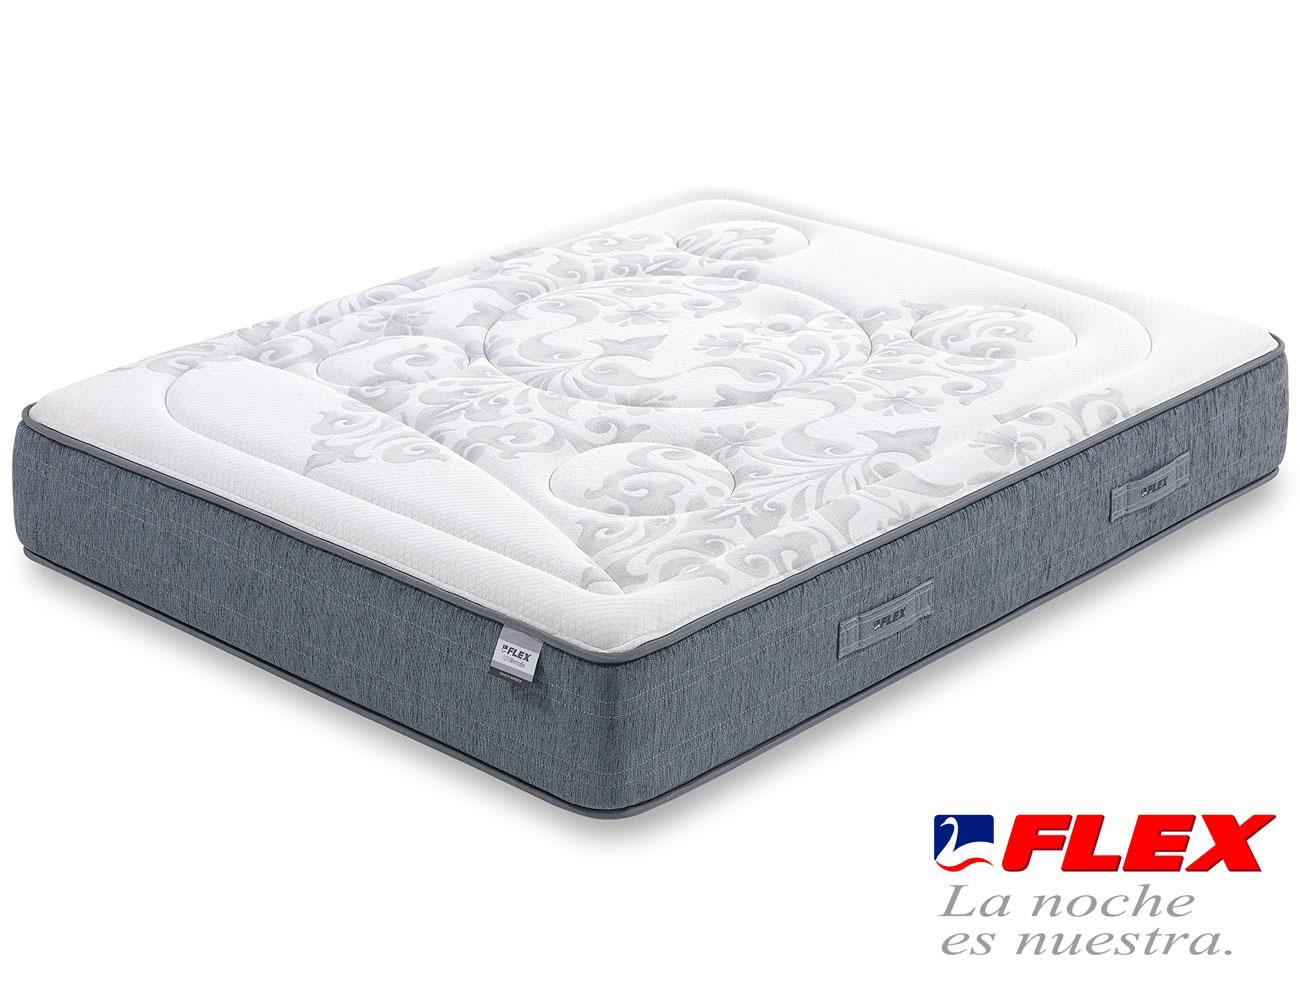 Colchon flex airvex viscoelastica gel garbi superior6